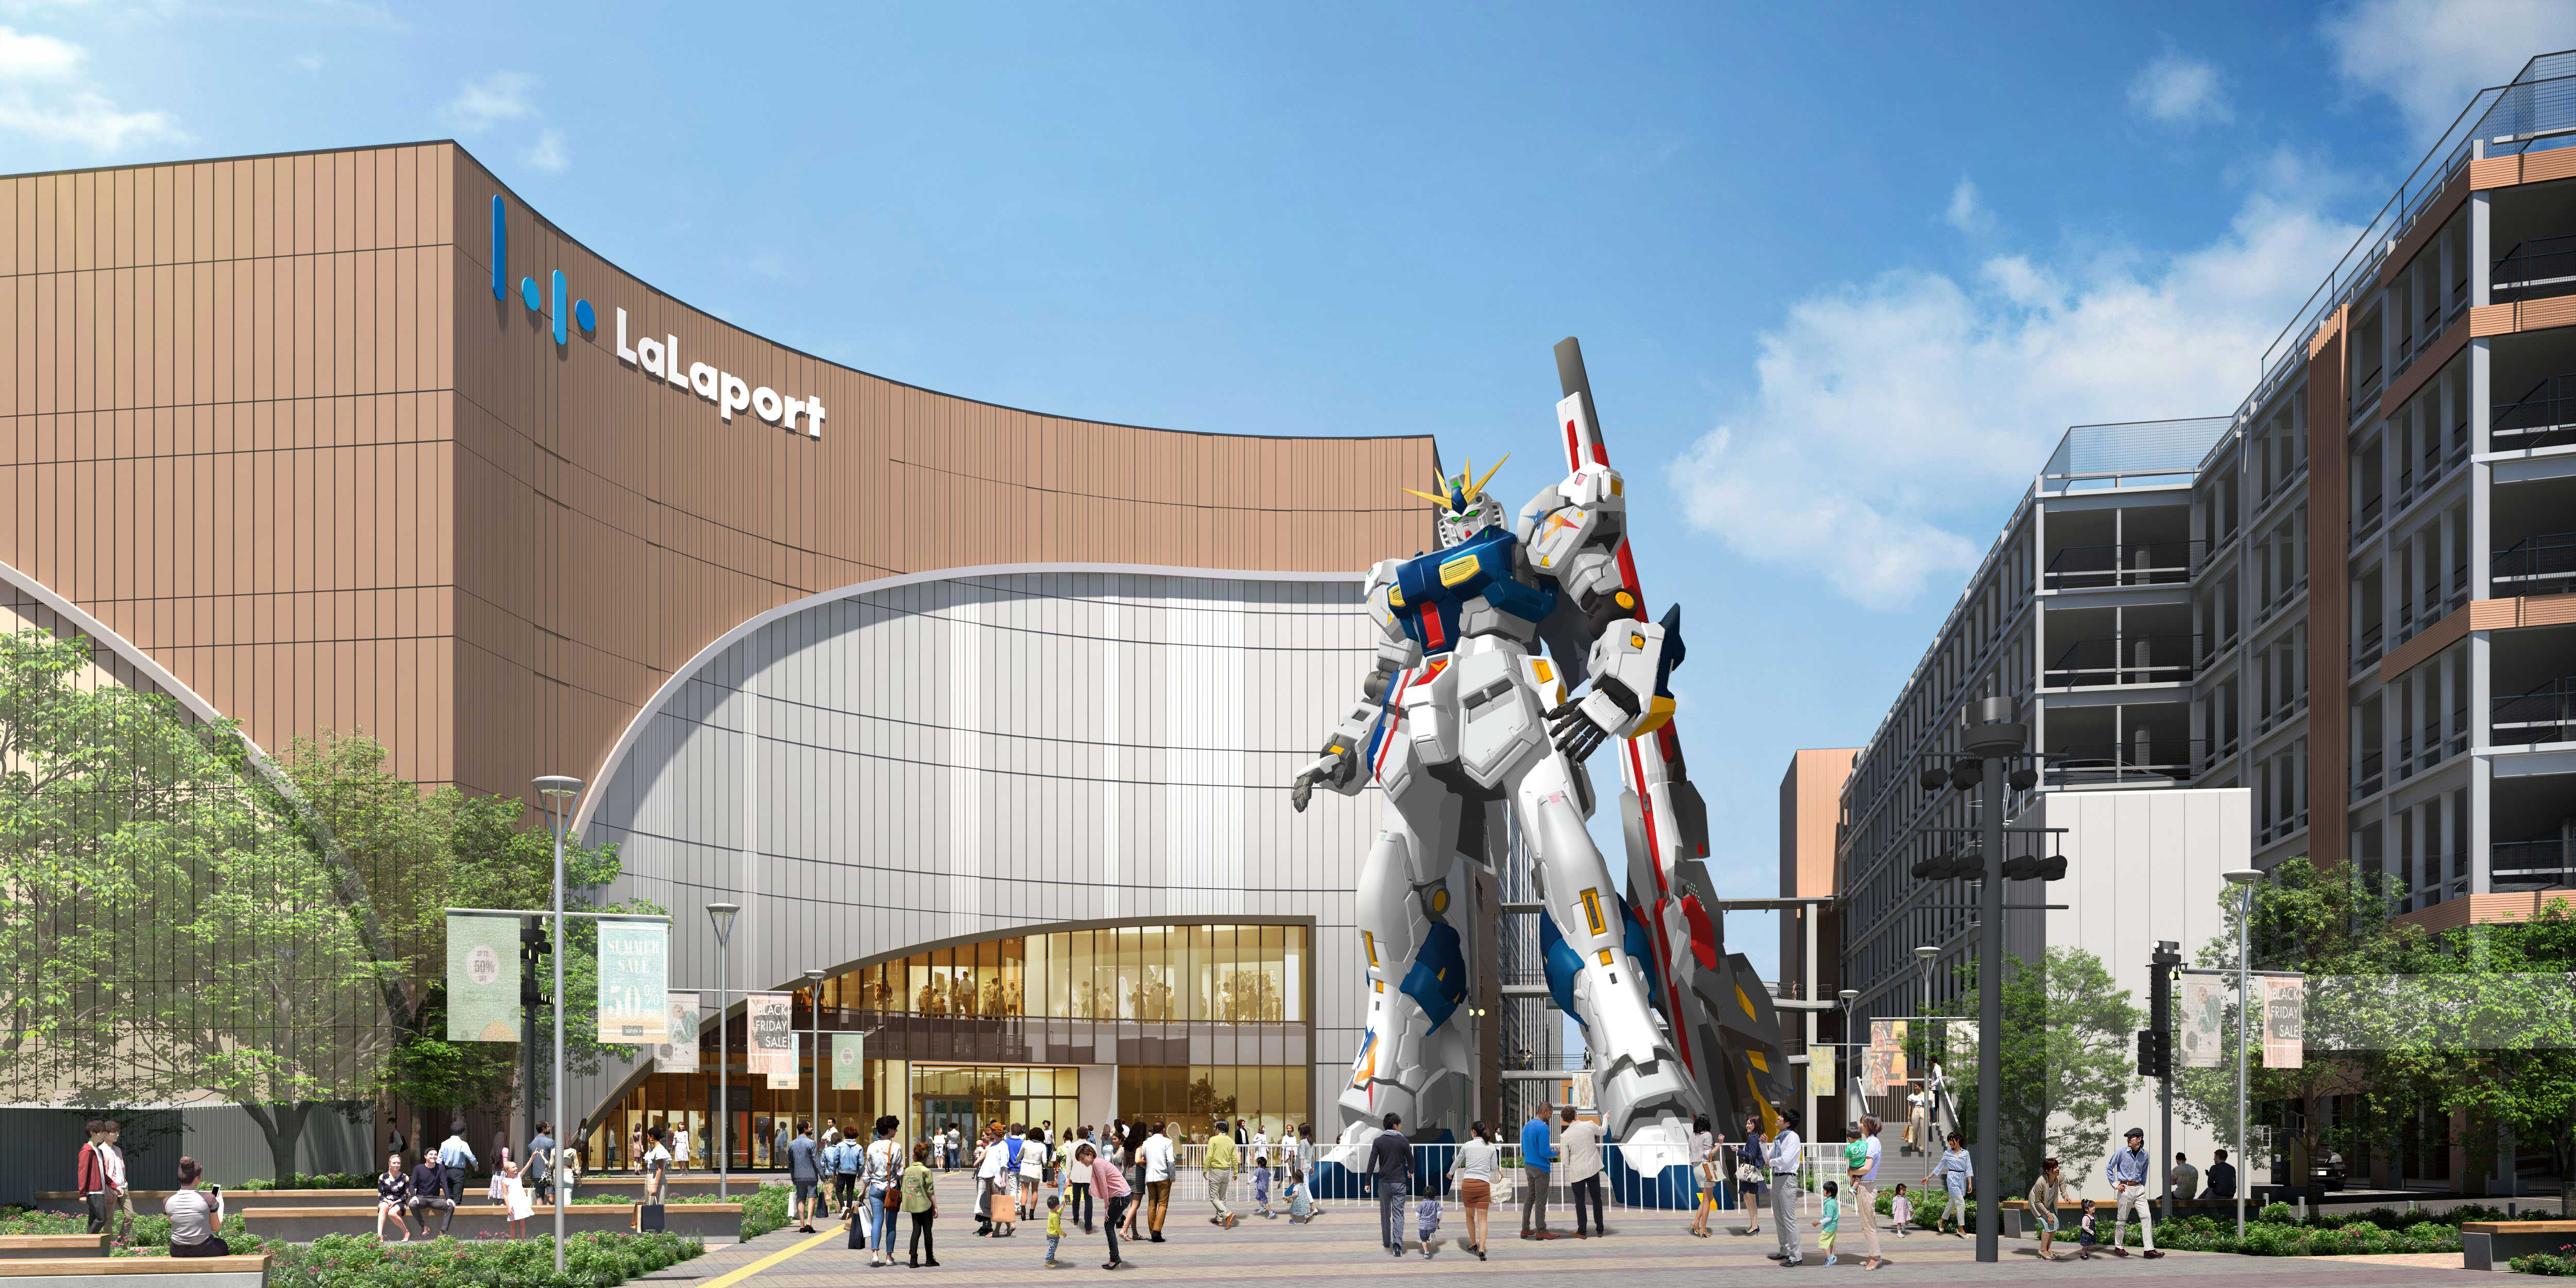 Gundam Lalaport Fukuoka